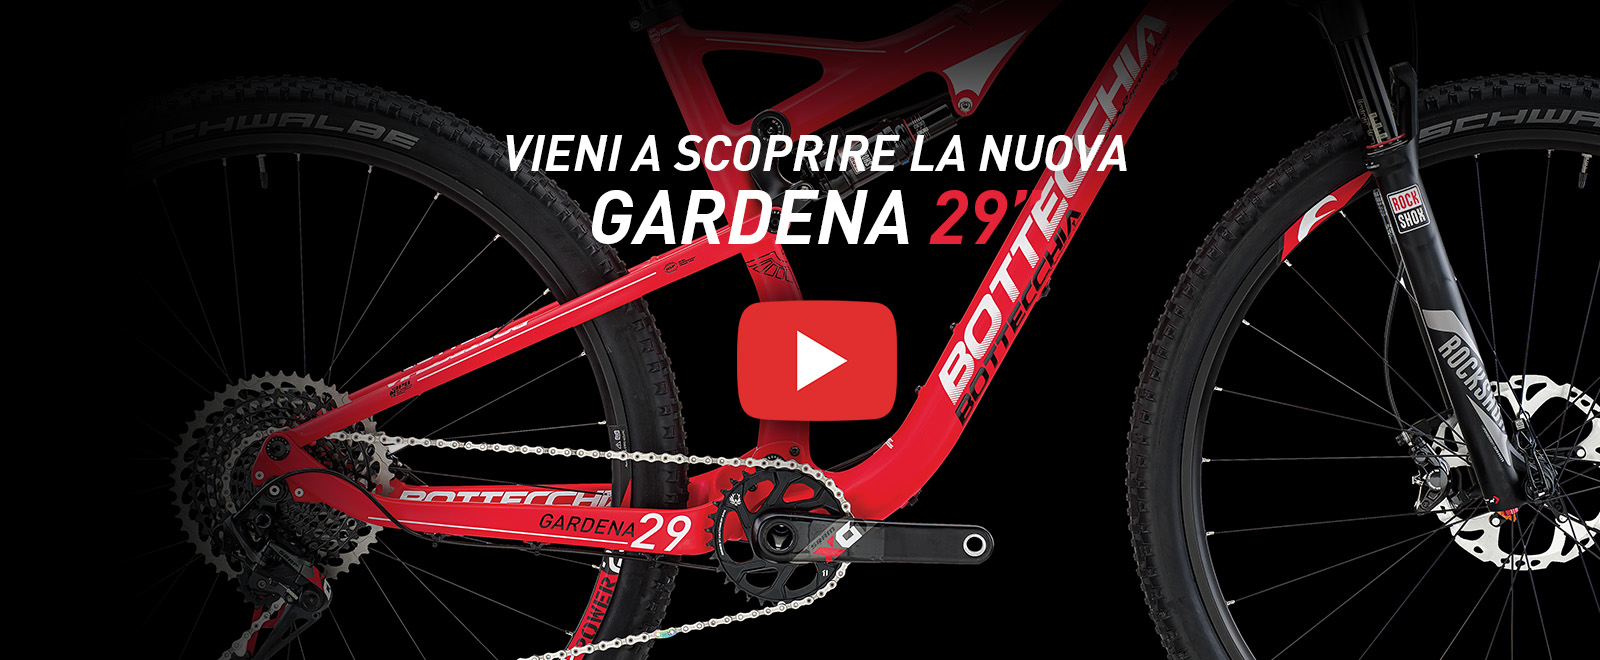 WEB_SLIDE_video-gardena29